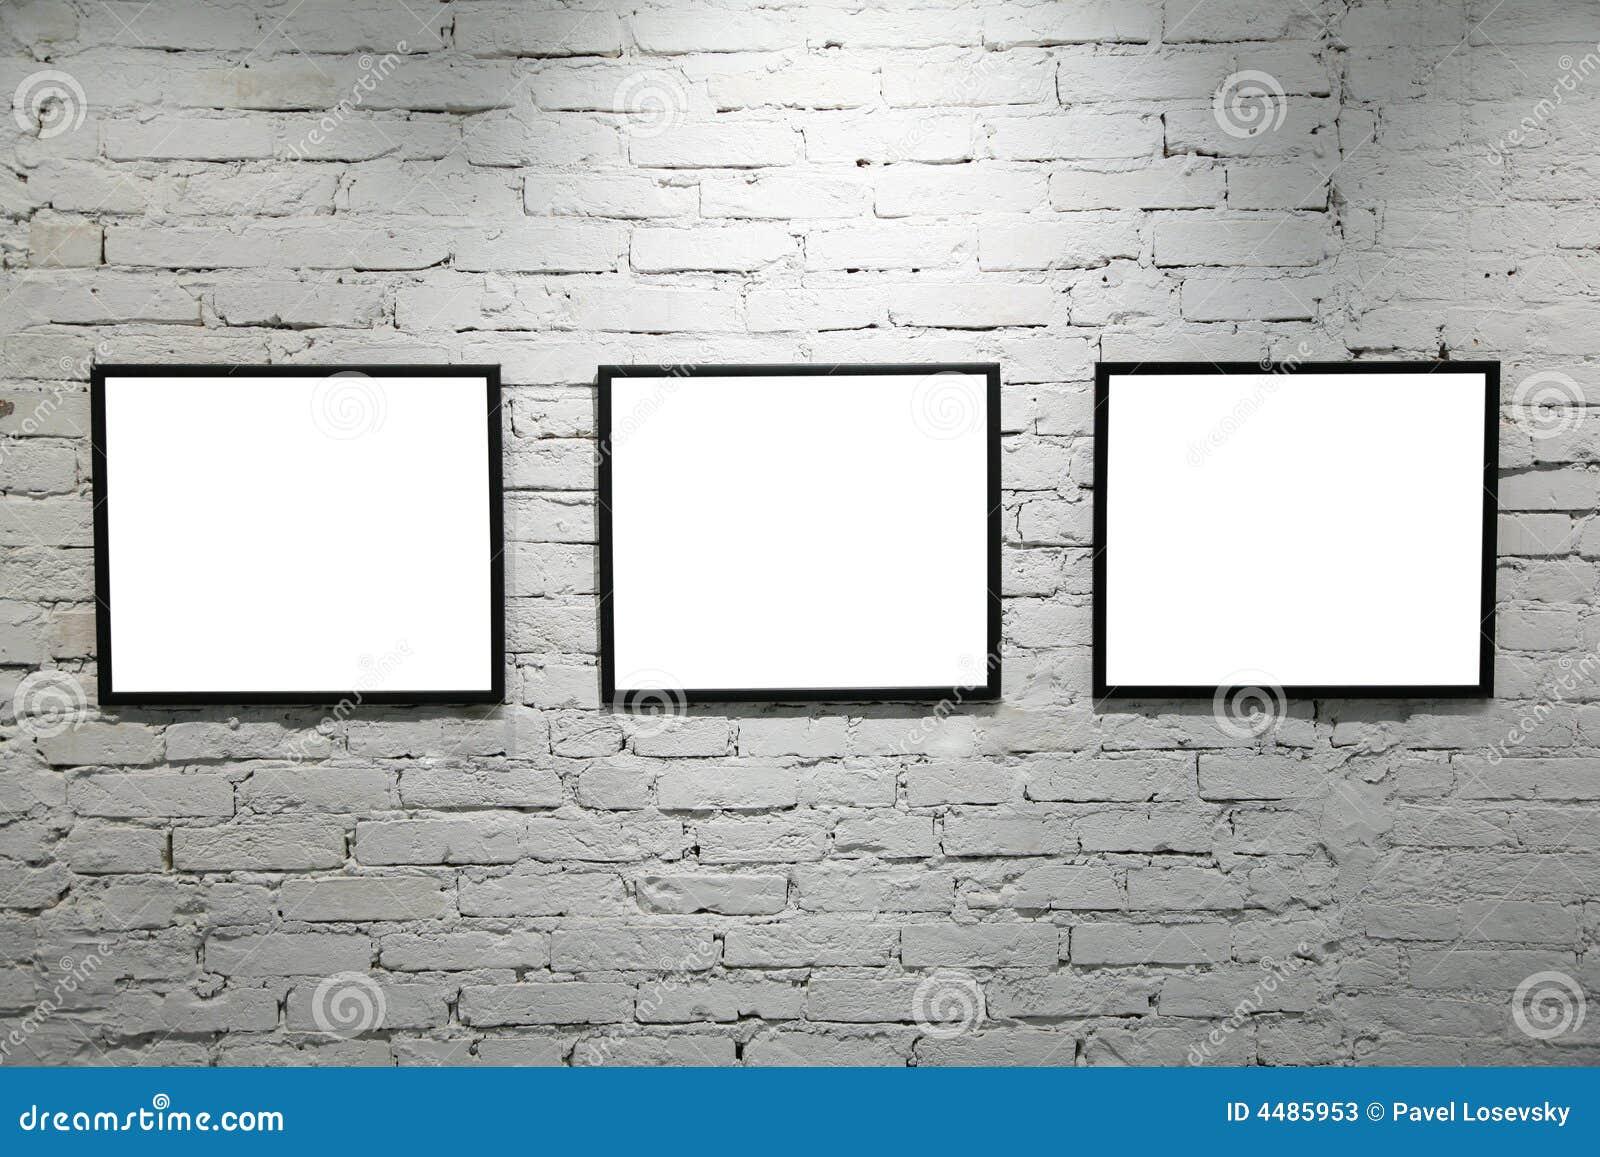 Black Frames On White Brick Wall 2 Stock Photos Image